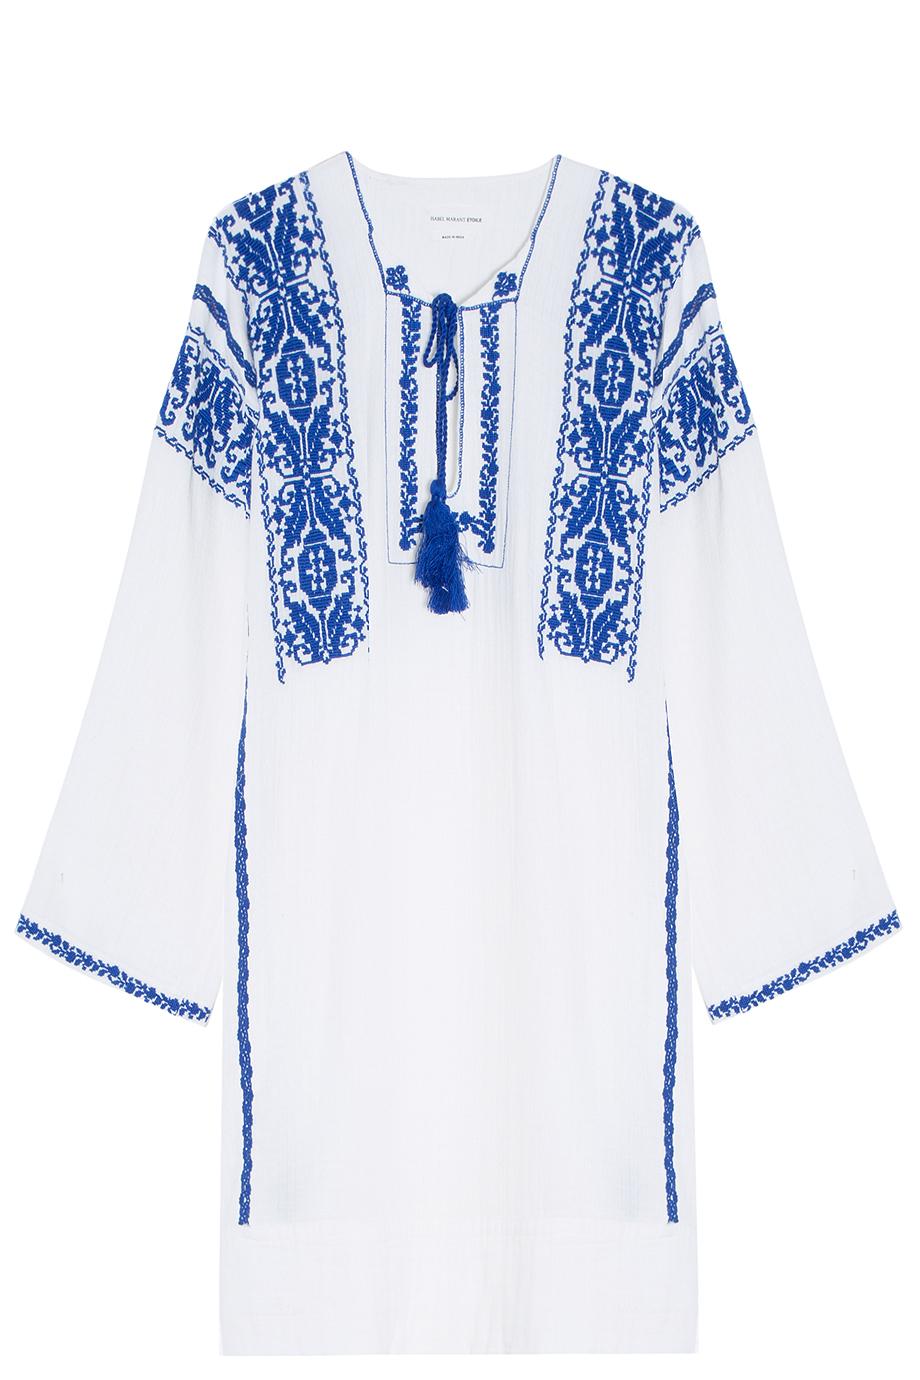 4e91fe4995bf08 Étoile Isabel Marant Vinny Embroidered Cotton-Blend Mini Dress in ...